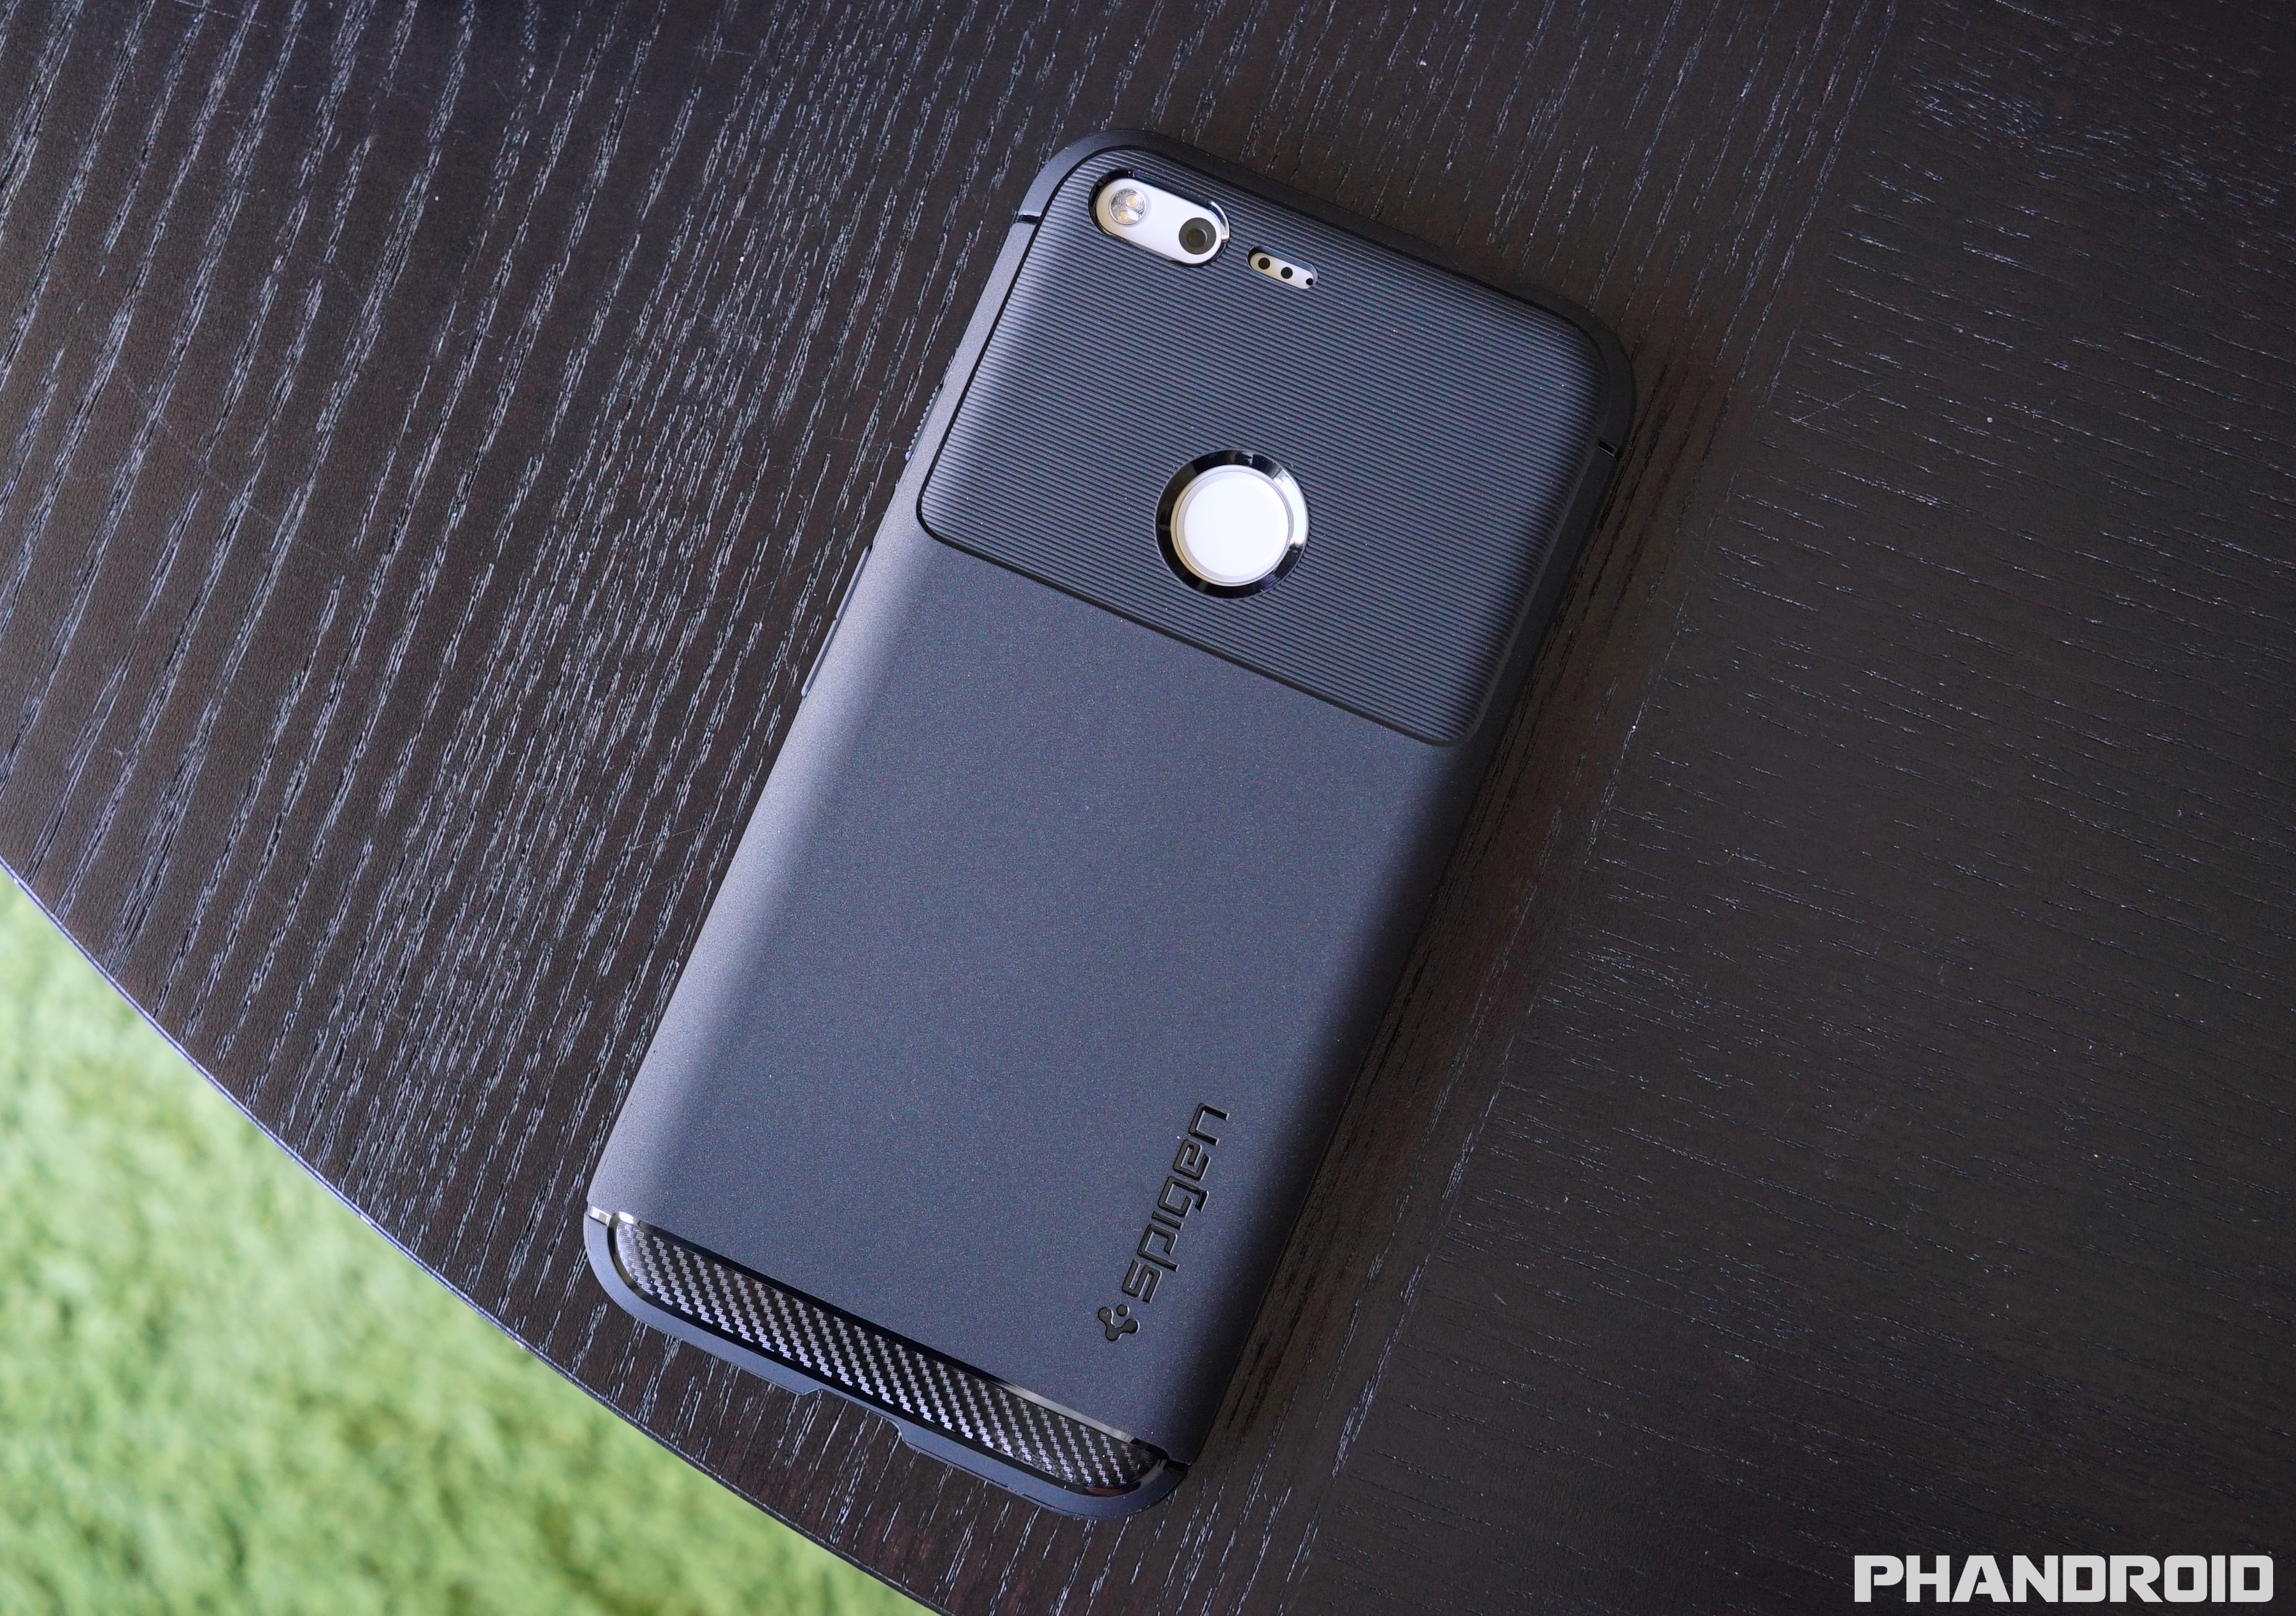 best website 7185b 8765f Hands-on: Spigen's entire case lineup for the Google Pixel [VIDEO]